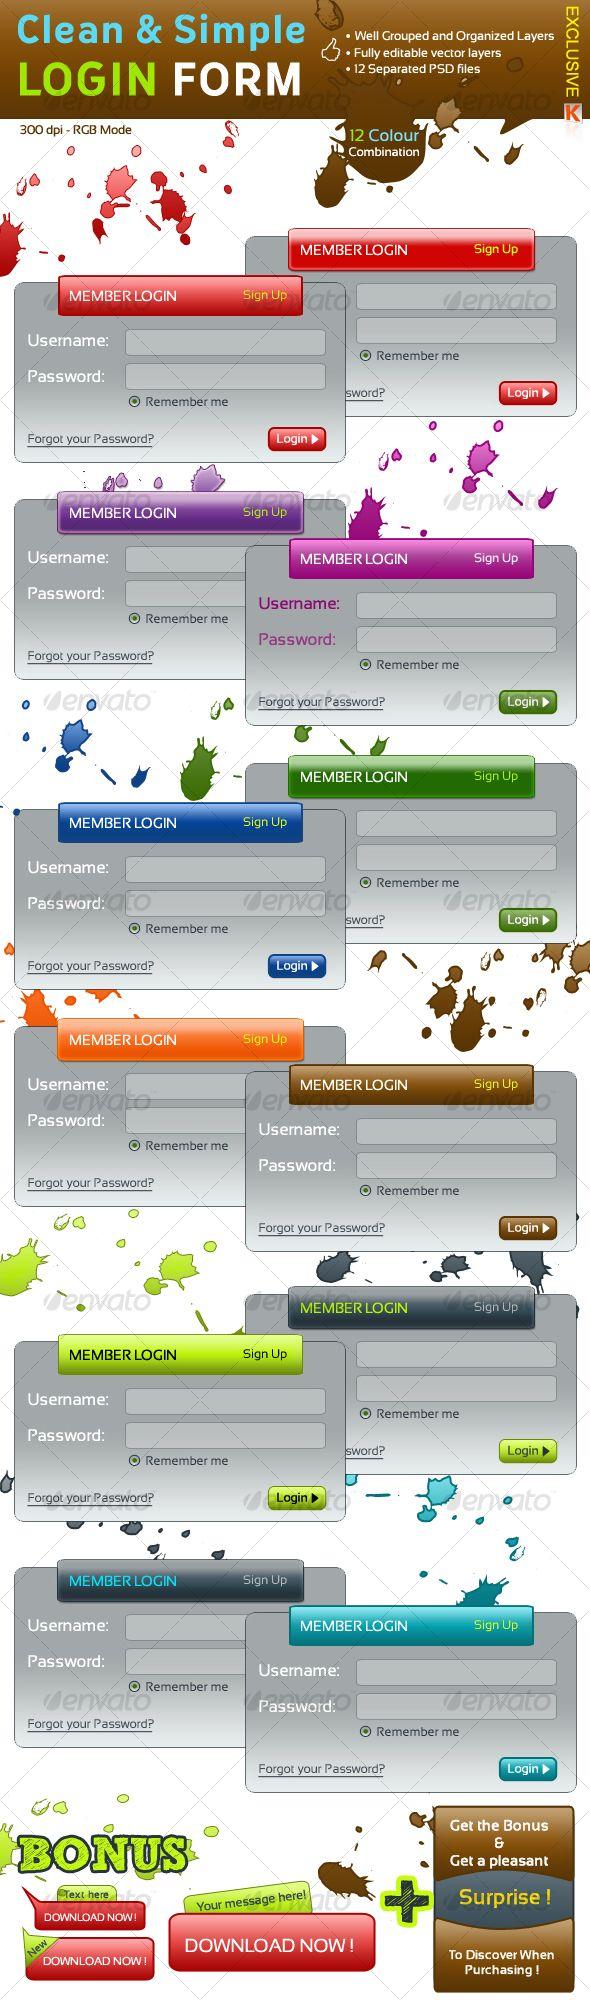 Clean & Simple Login Form Login form, Web box, Website